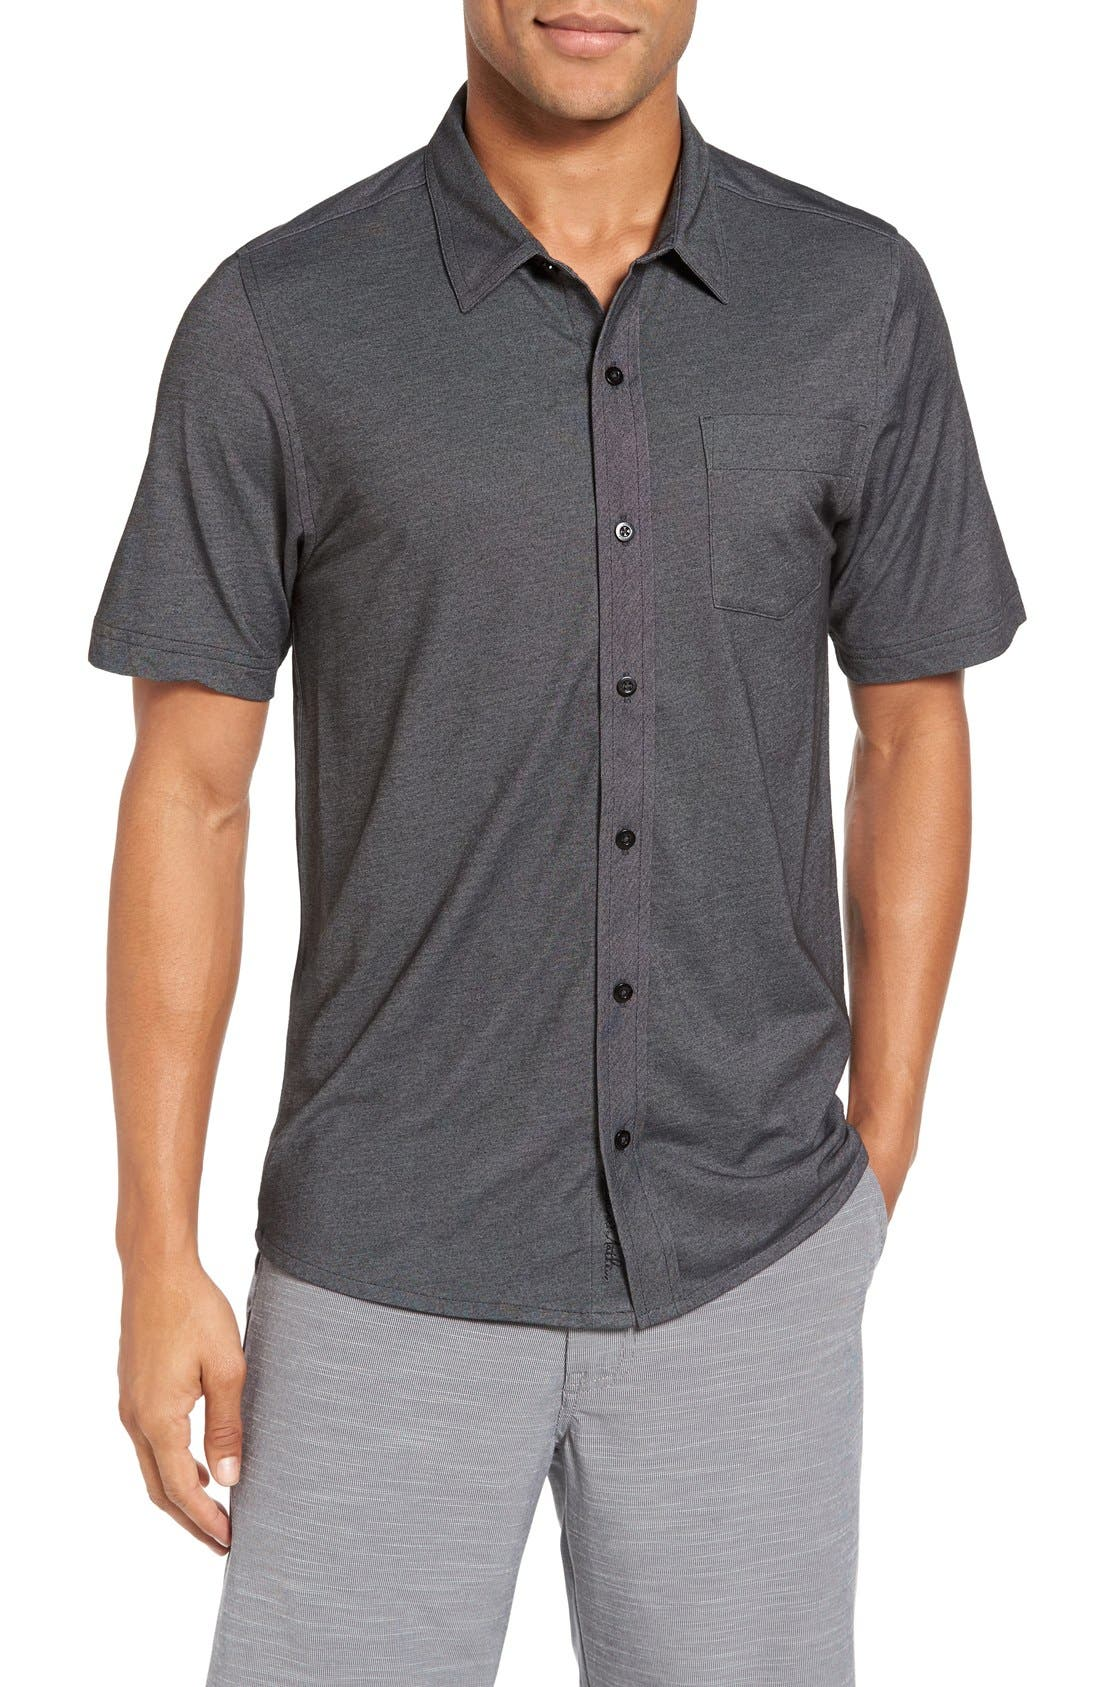 Hines Slim Fit Wrinkle Resistant Sport Shirt,                         Main,                         color, Black